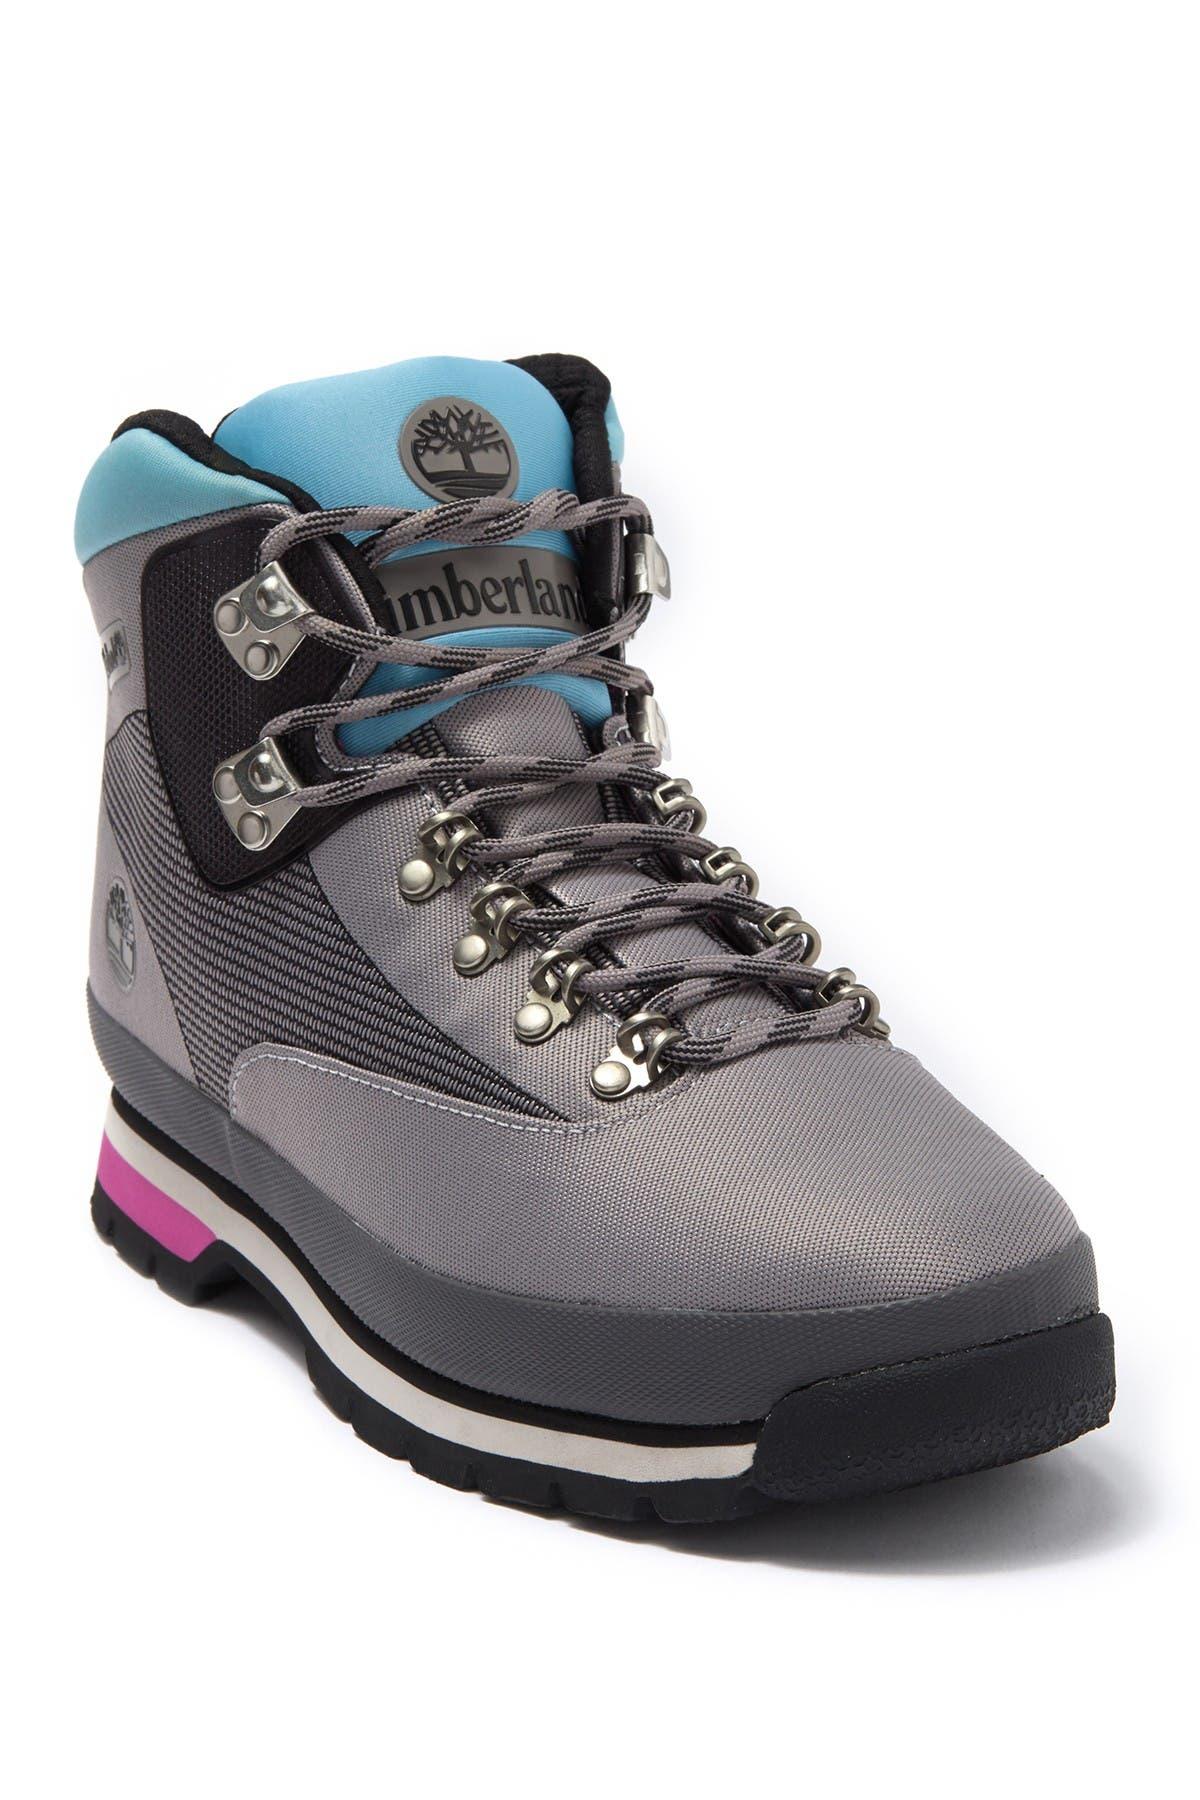 Timberland | Euro Hiker Jacquard Boot